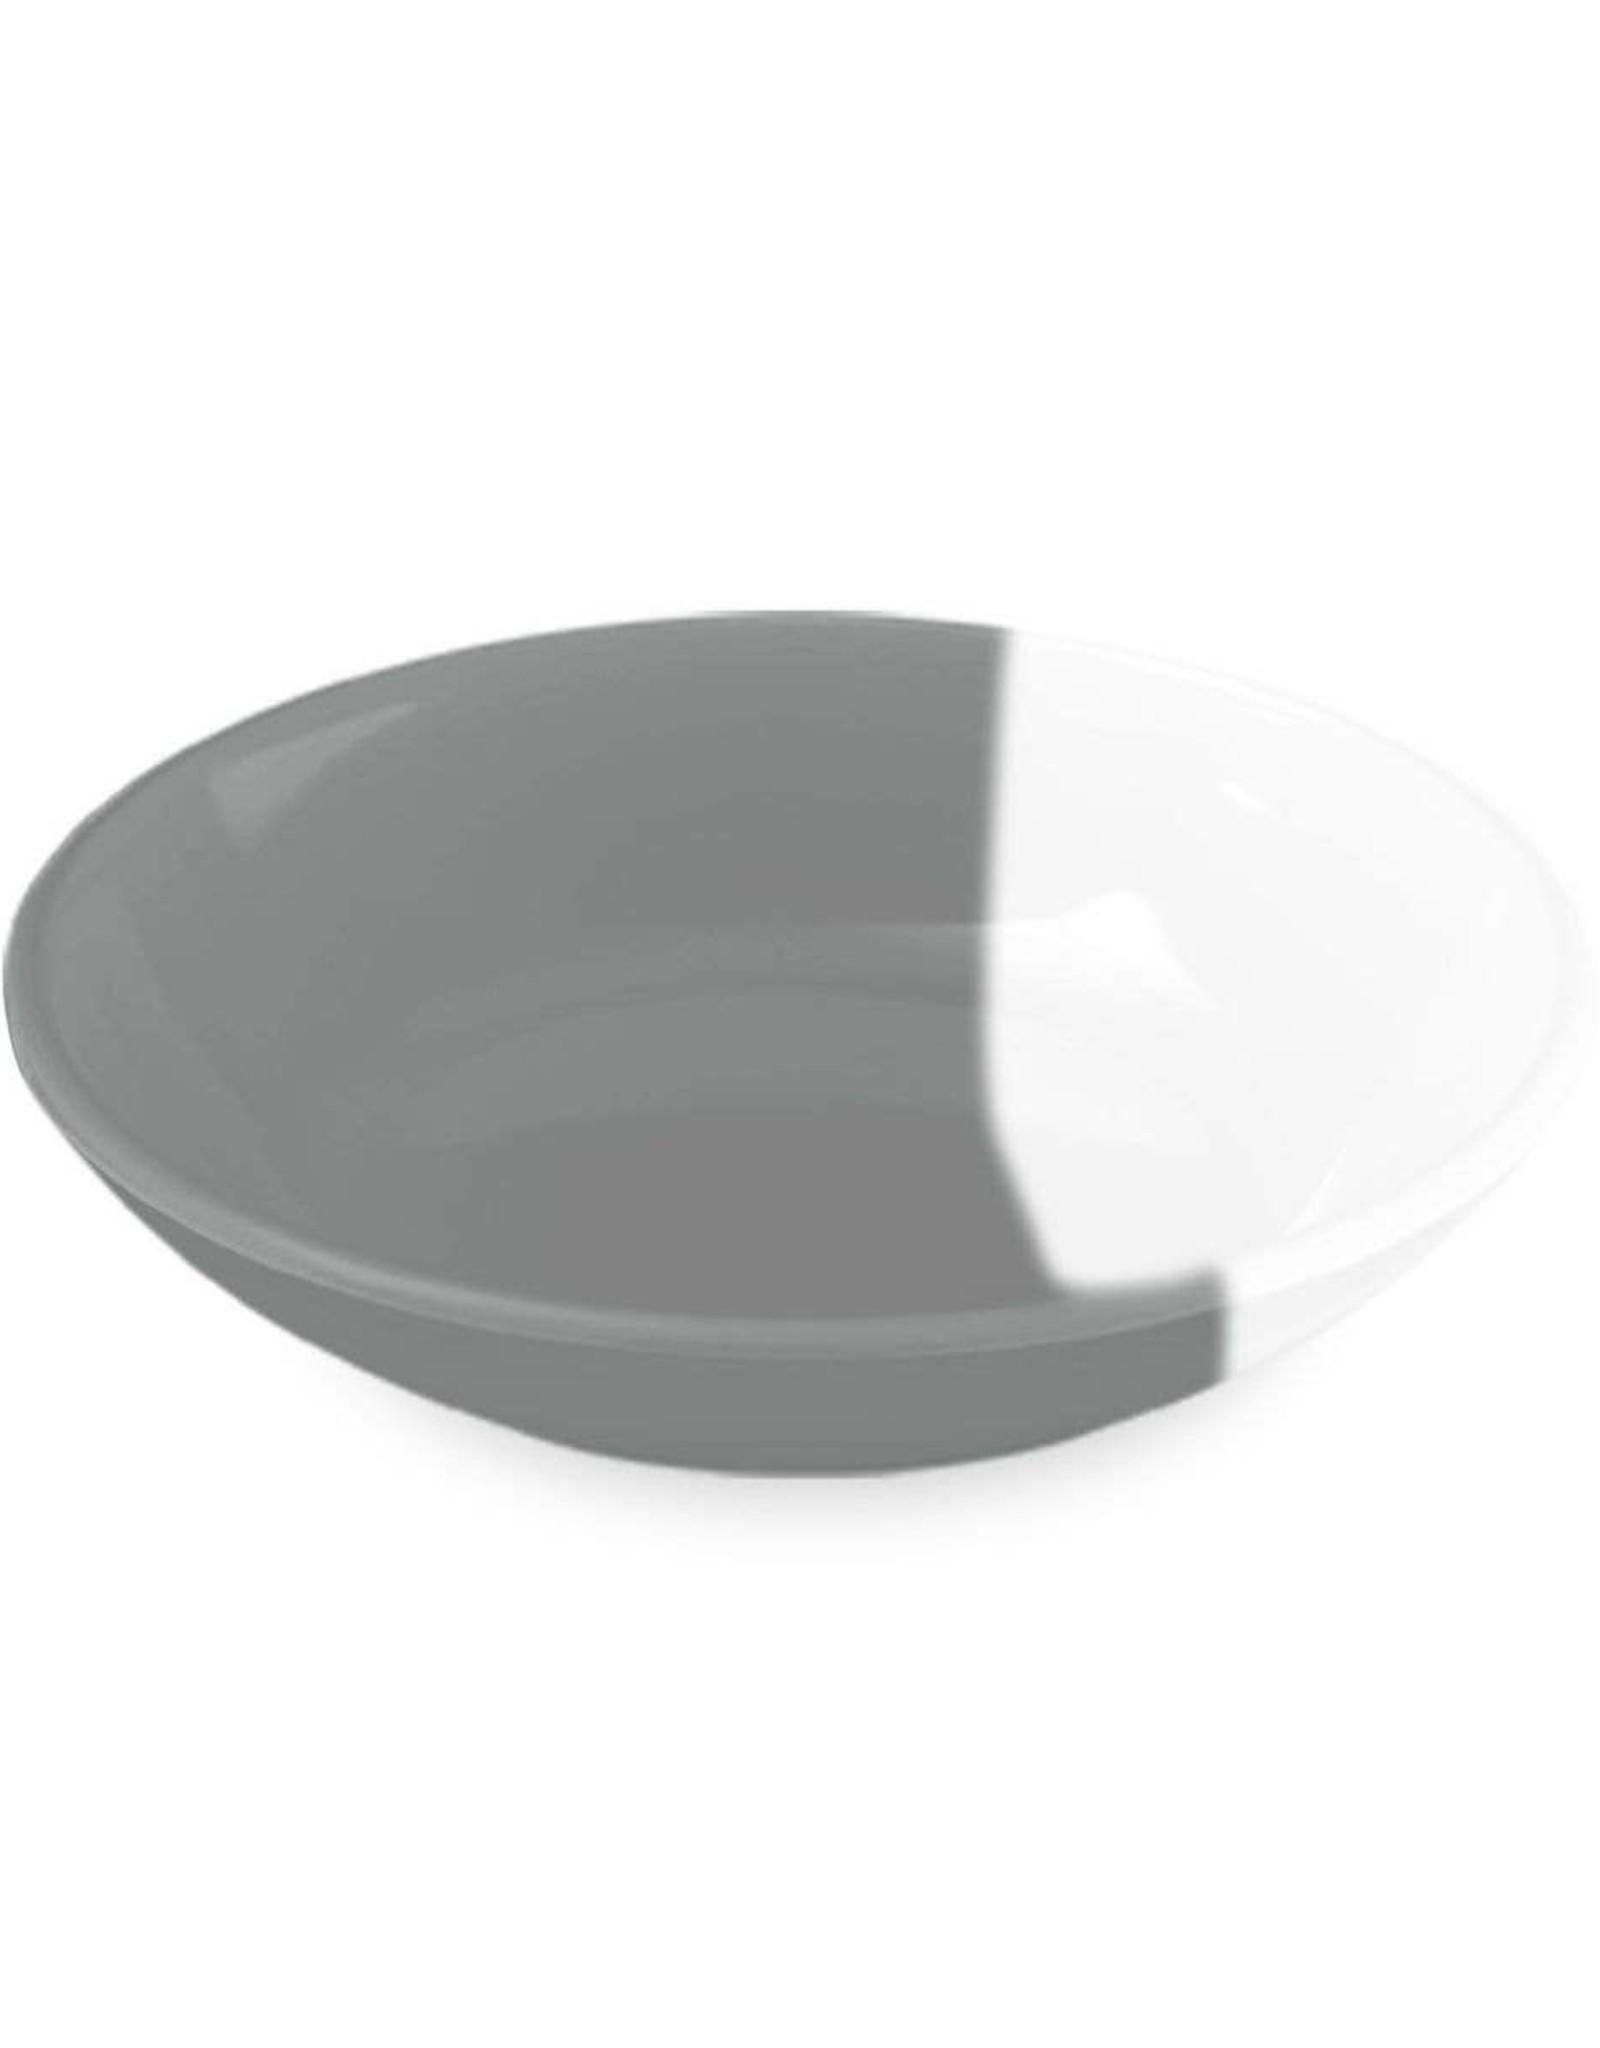 TarHong Gray/White Pet Saucer